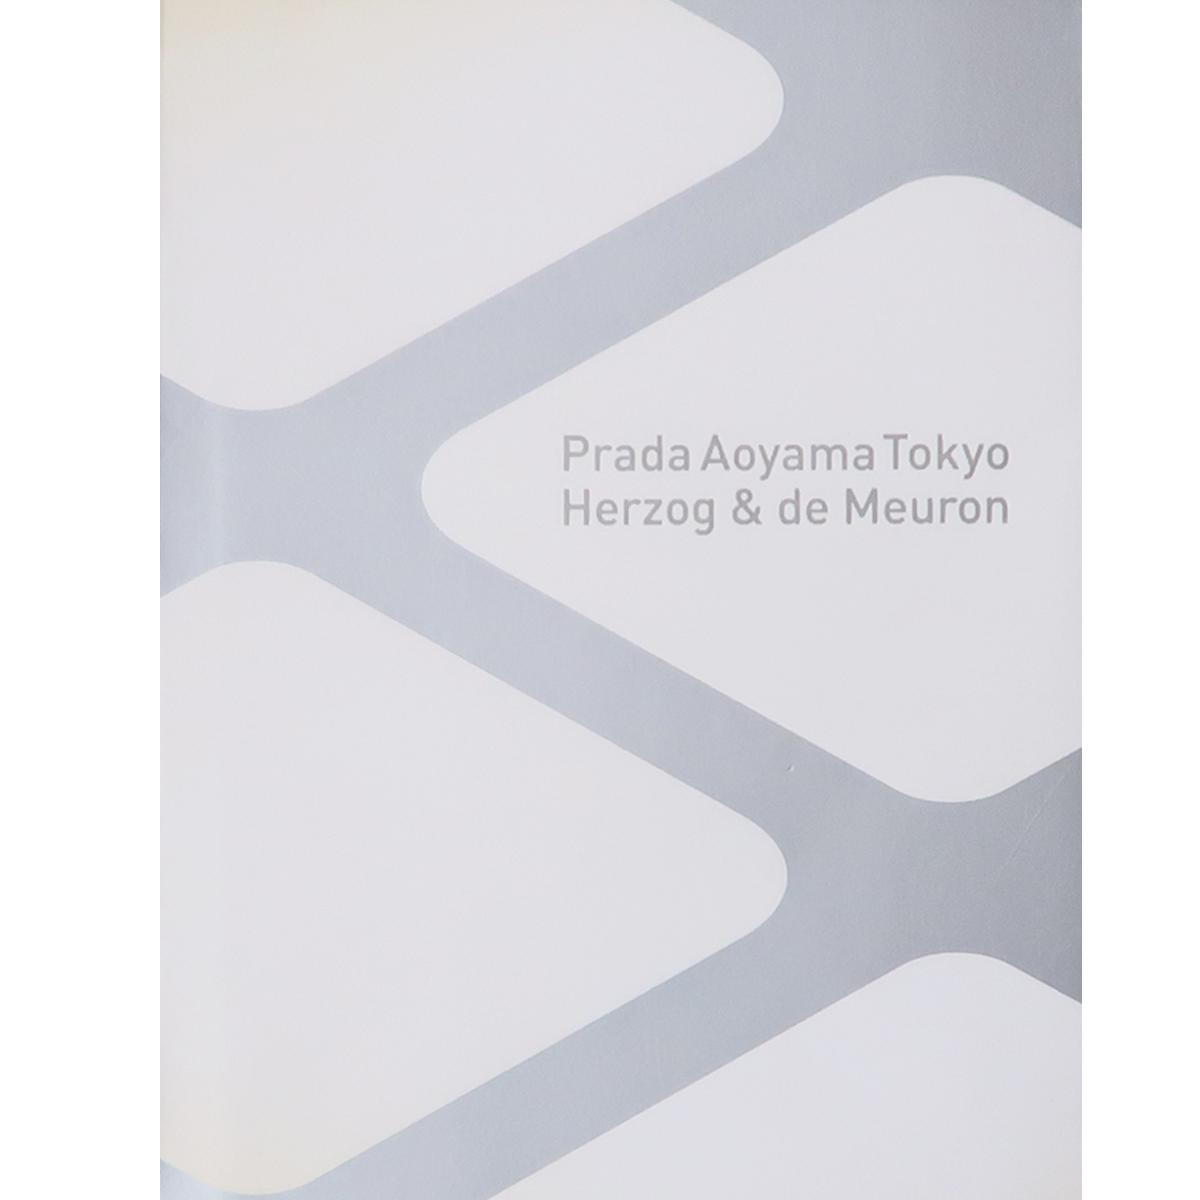 Prada Aoyama Tokyo